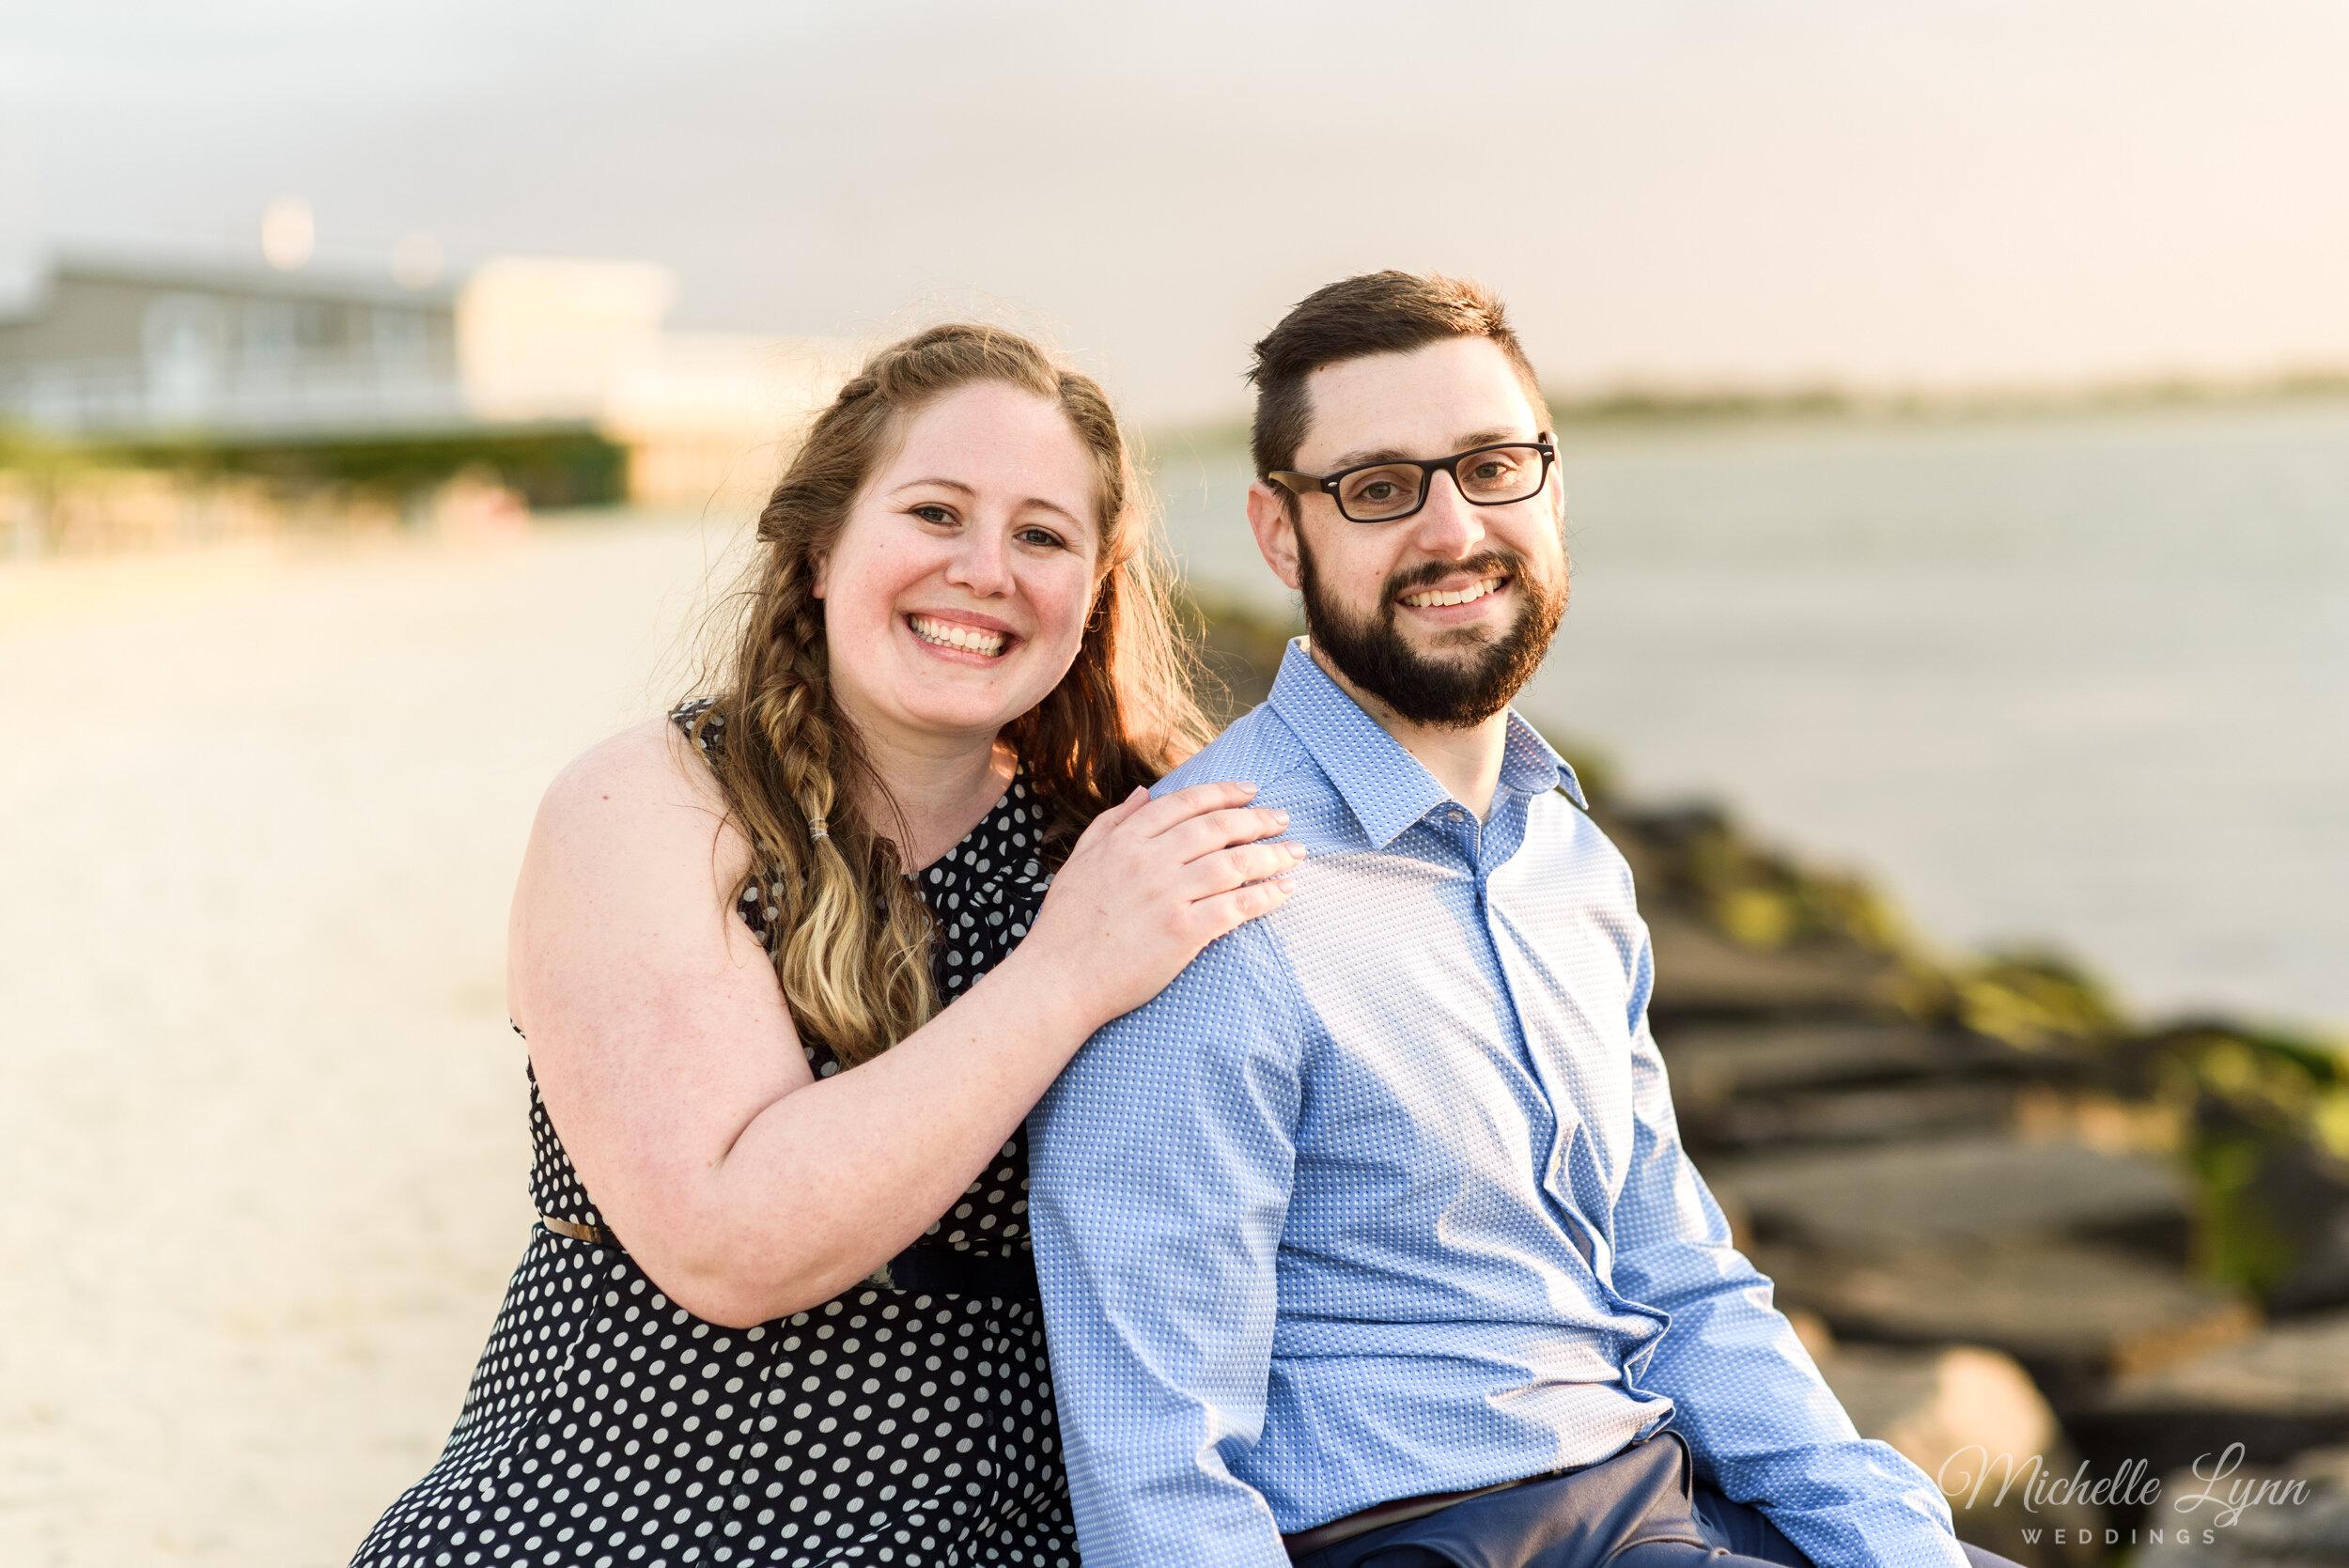 barnegat-lighthouse-engagement-photos-michelle-lynn-weddings-23.jpg